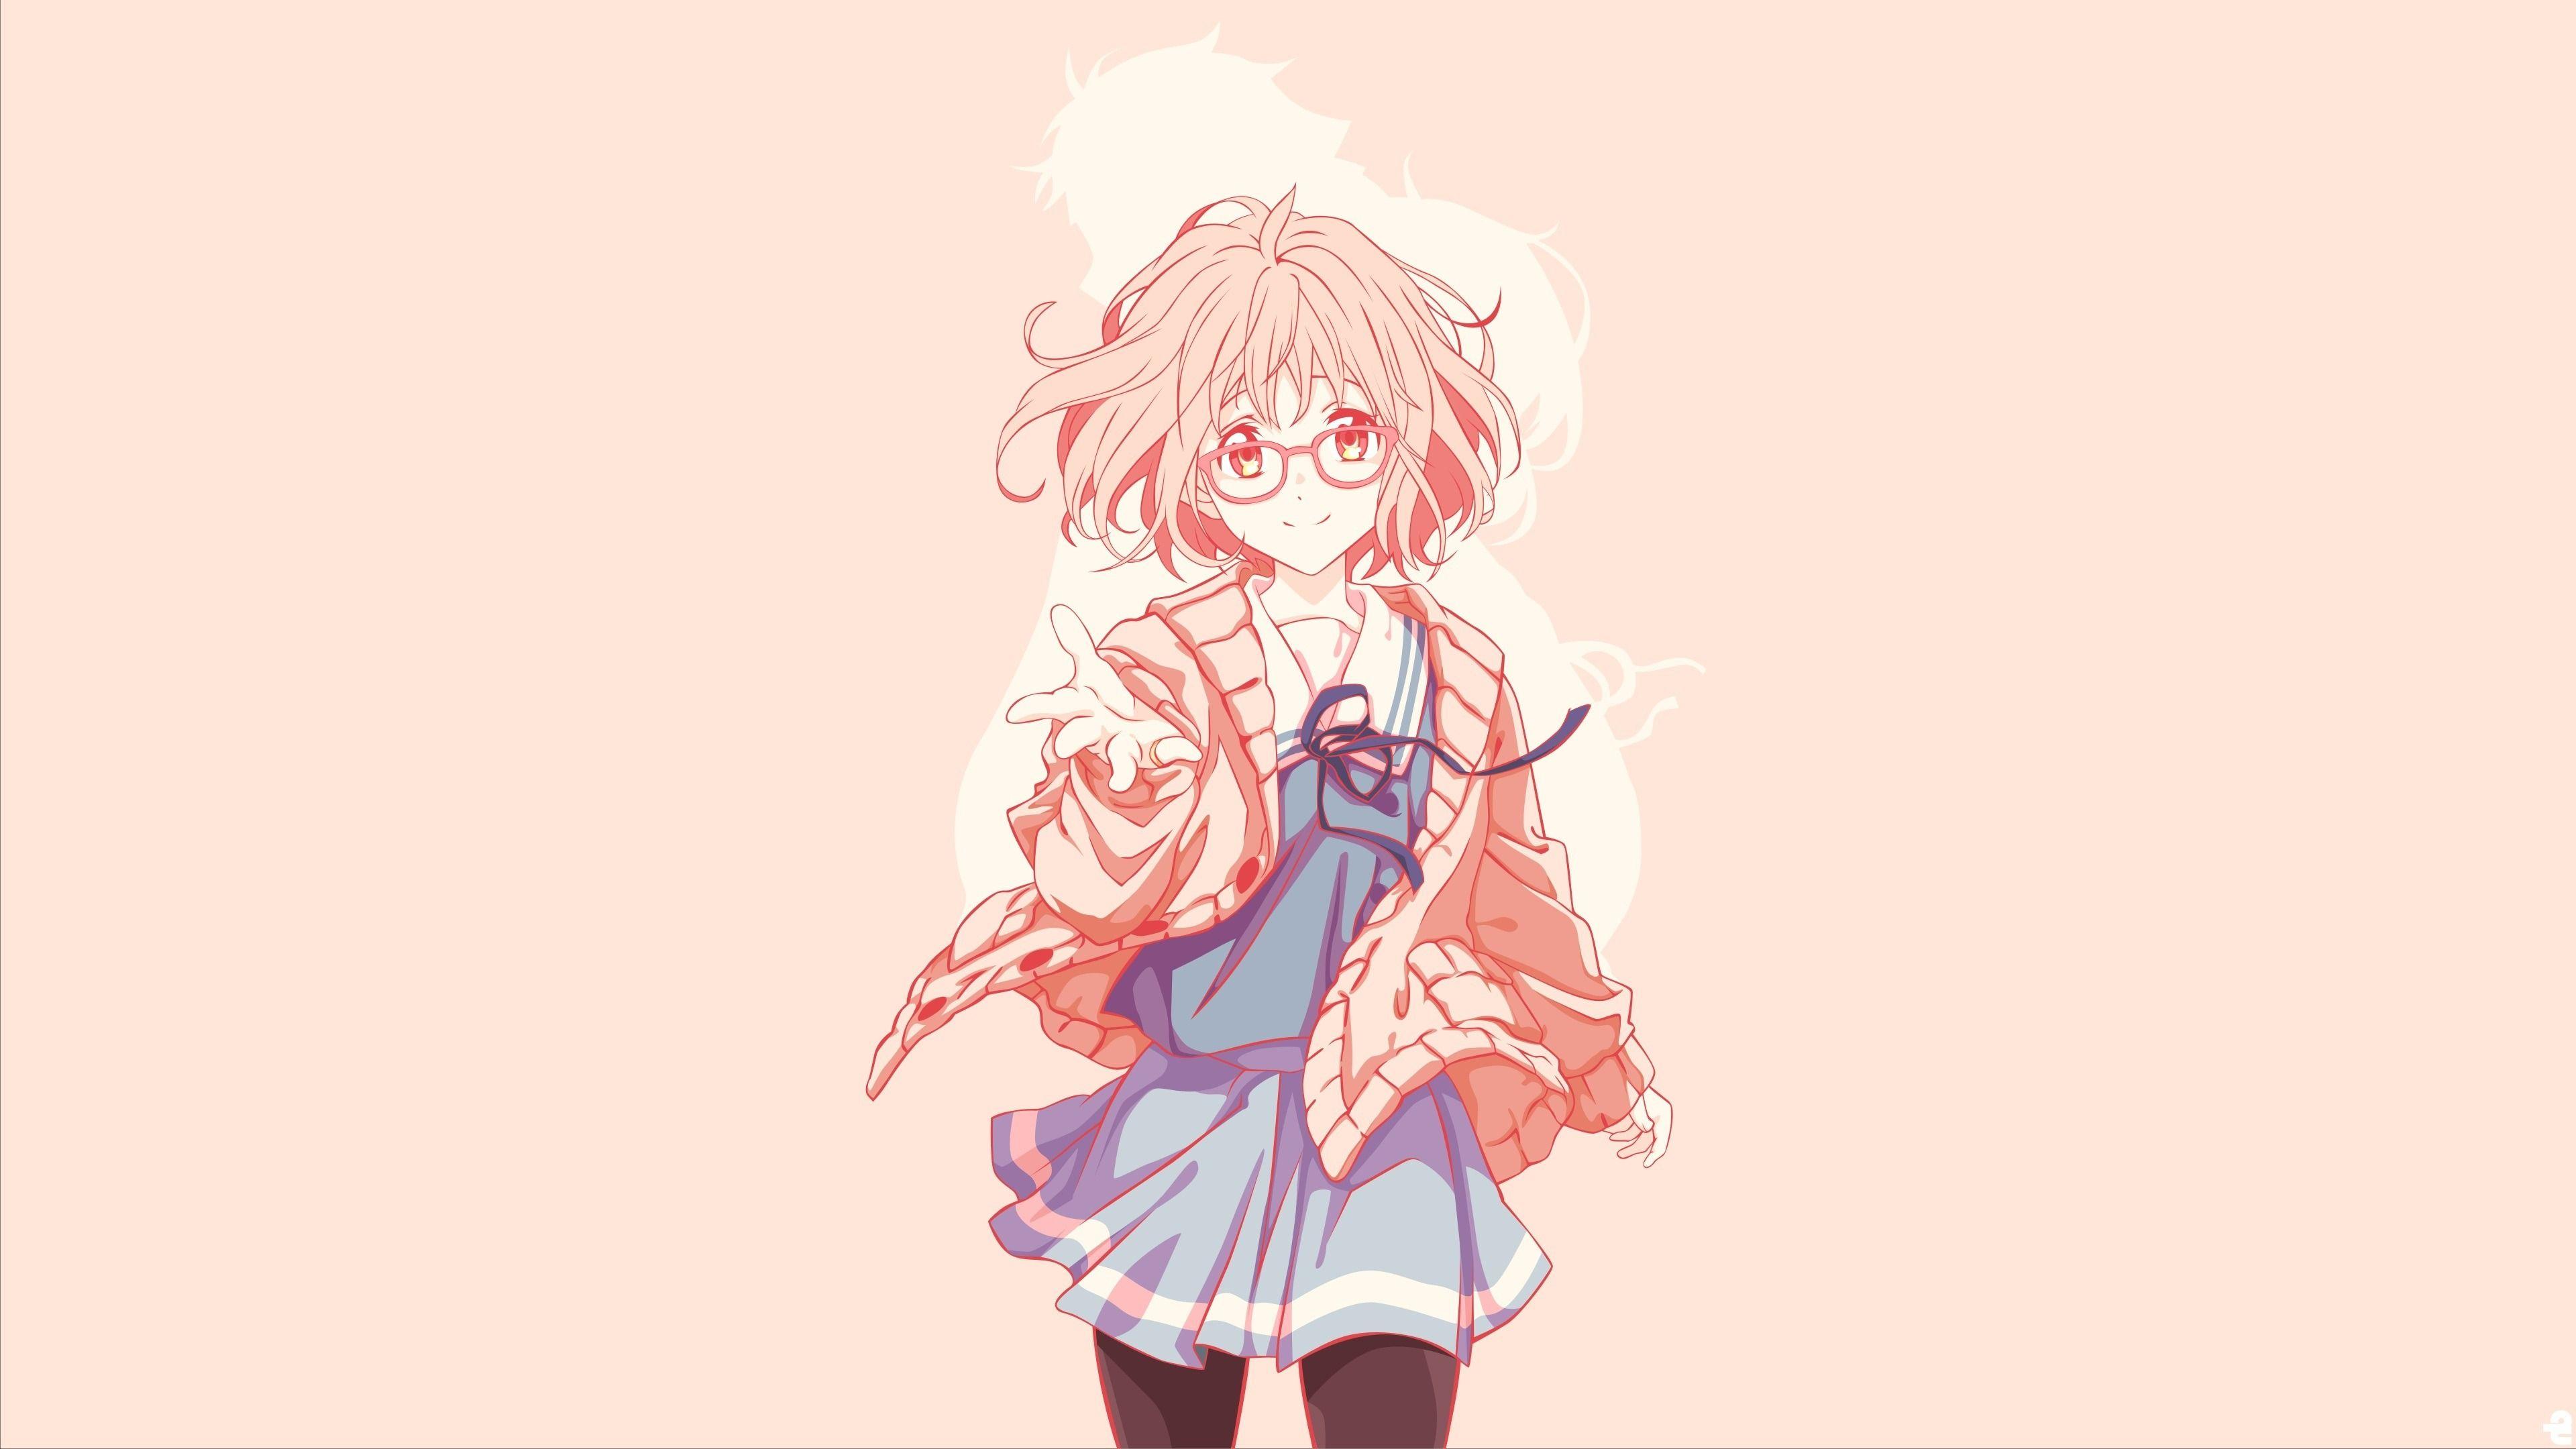 Kimetsu No Yaiba Wallpaper 3d Anime Wallpaper Anime Android Wallpaper Anime